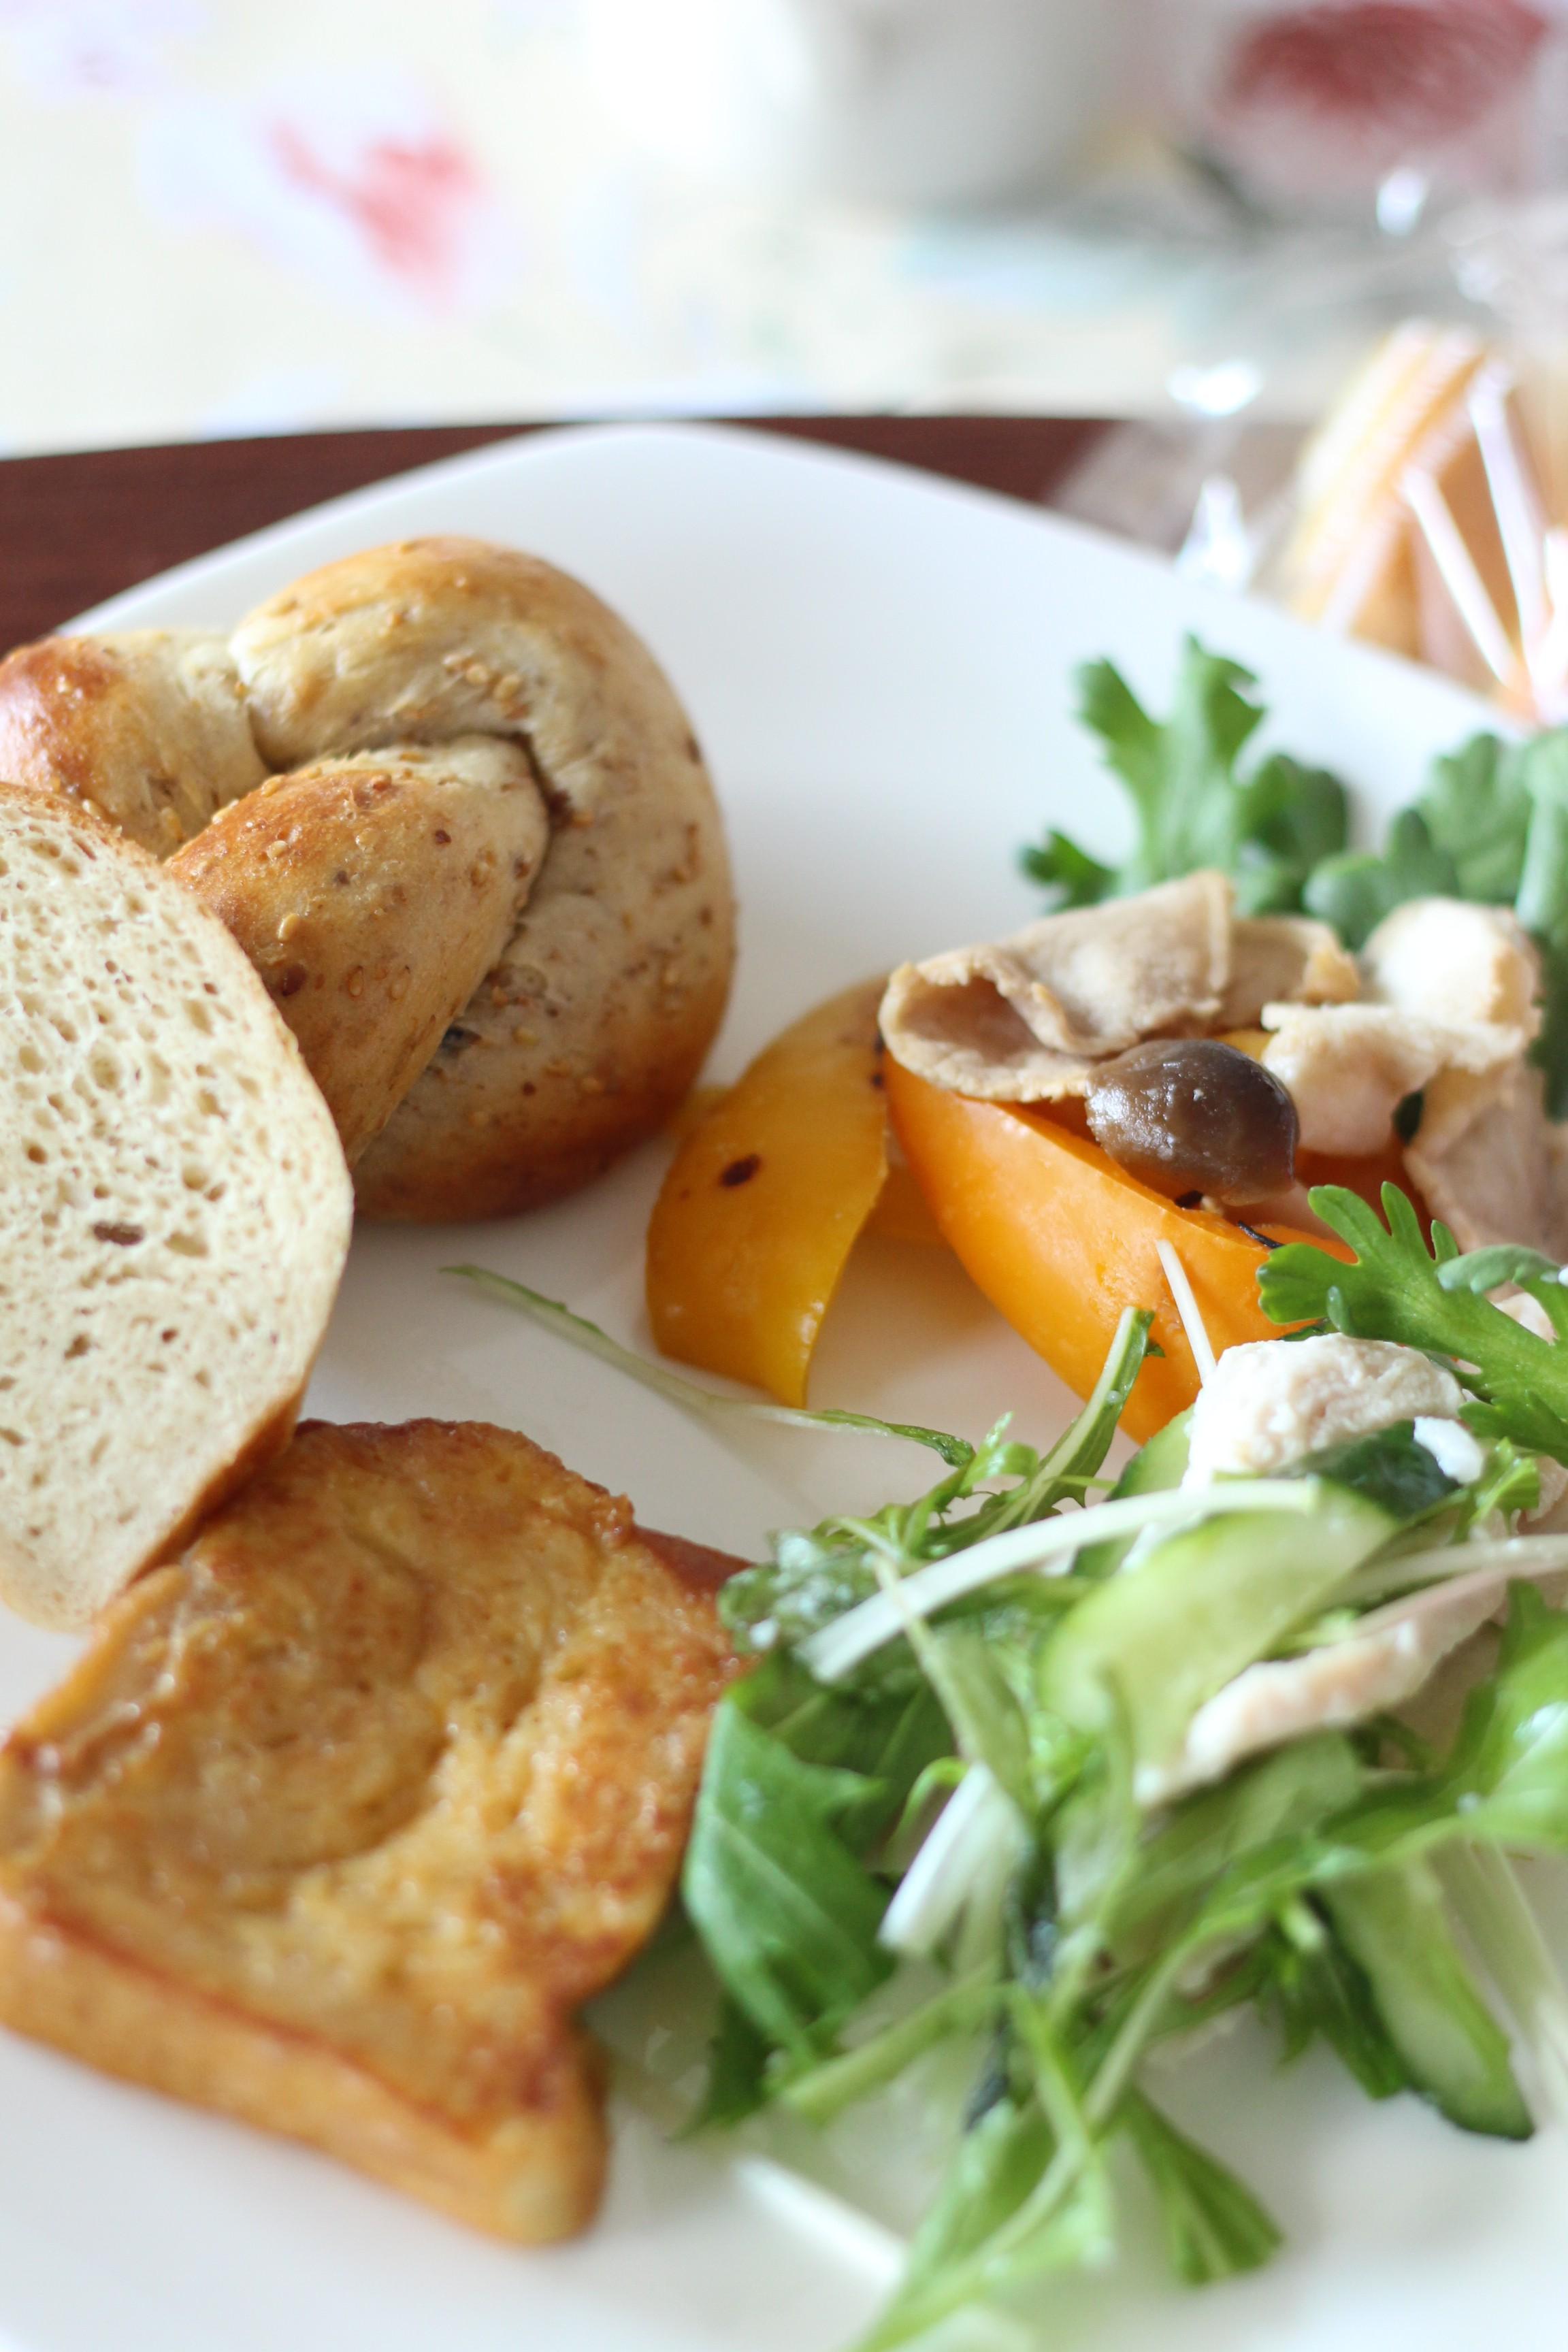 a-ta-sante京都江部粉糖質制限パン・料理教室ベーシックコース、最終回。山食&ごまパン